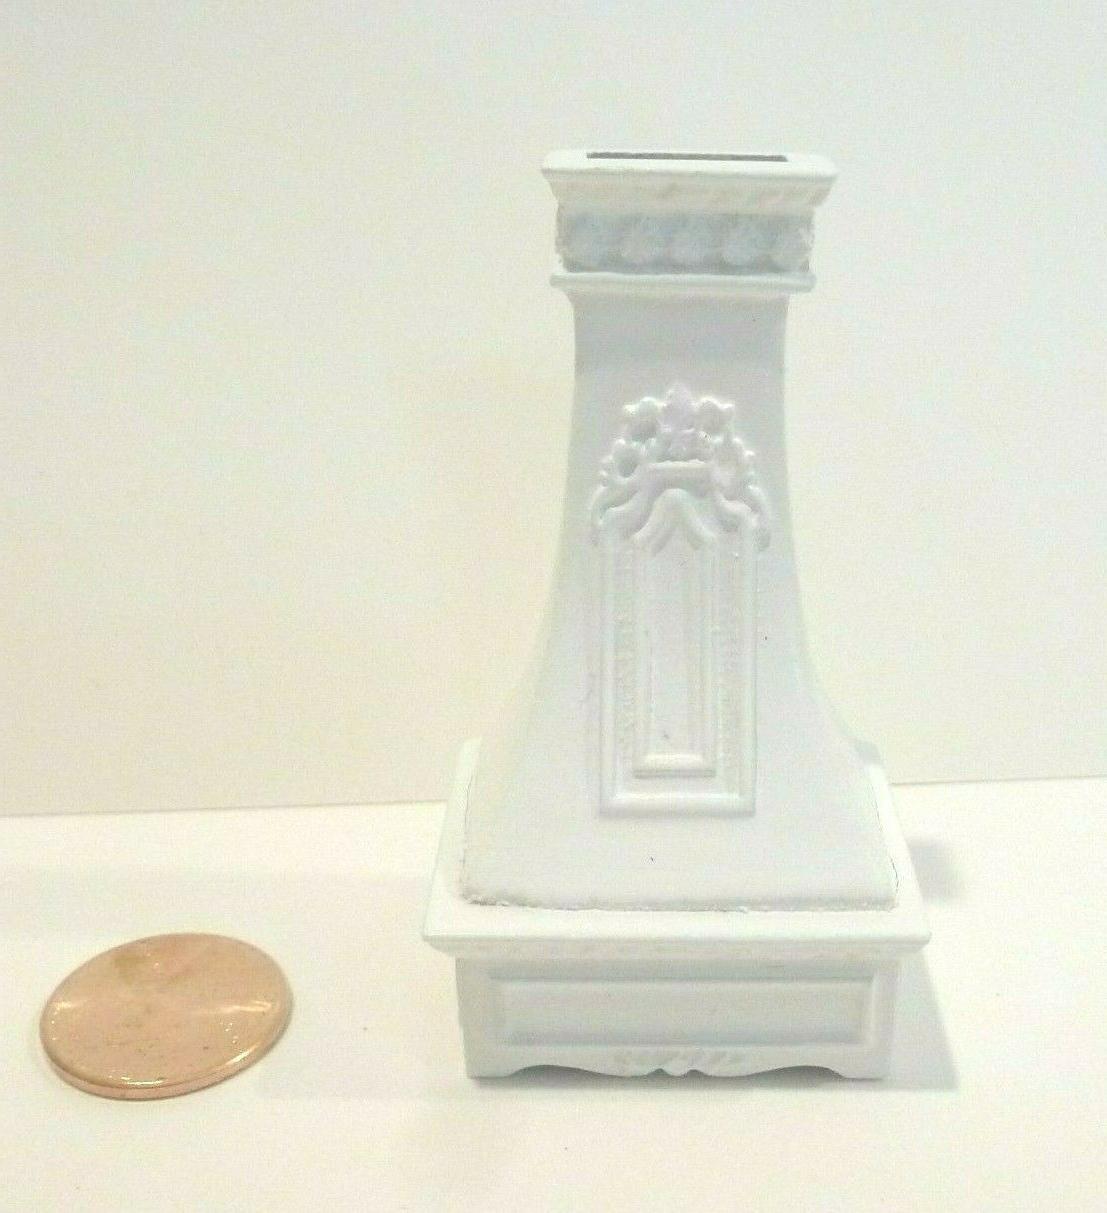 dollhouse miniature 1 2 scale miss julia